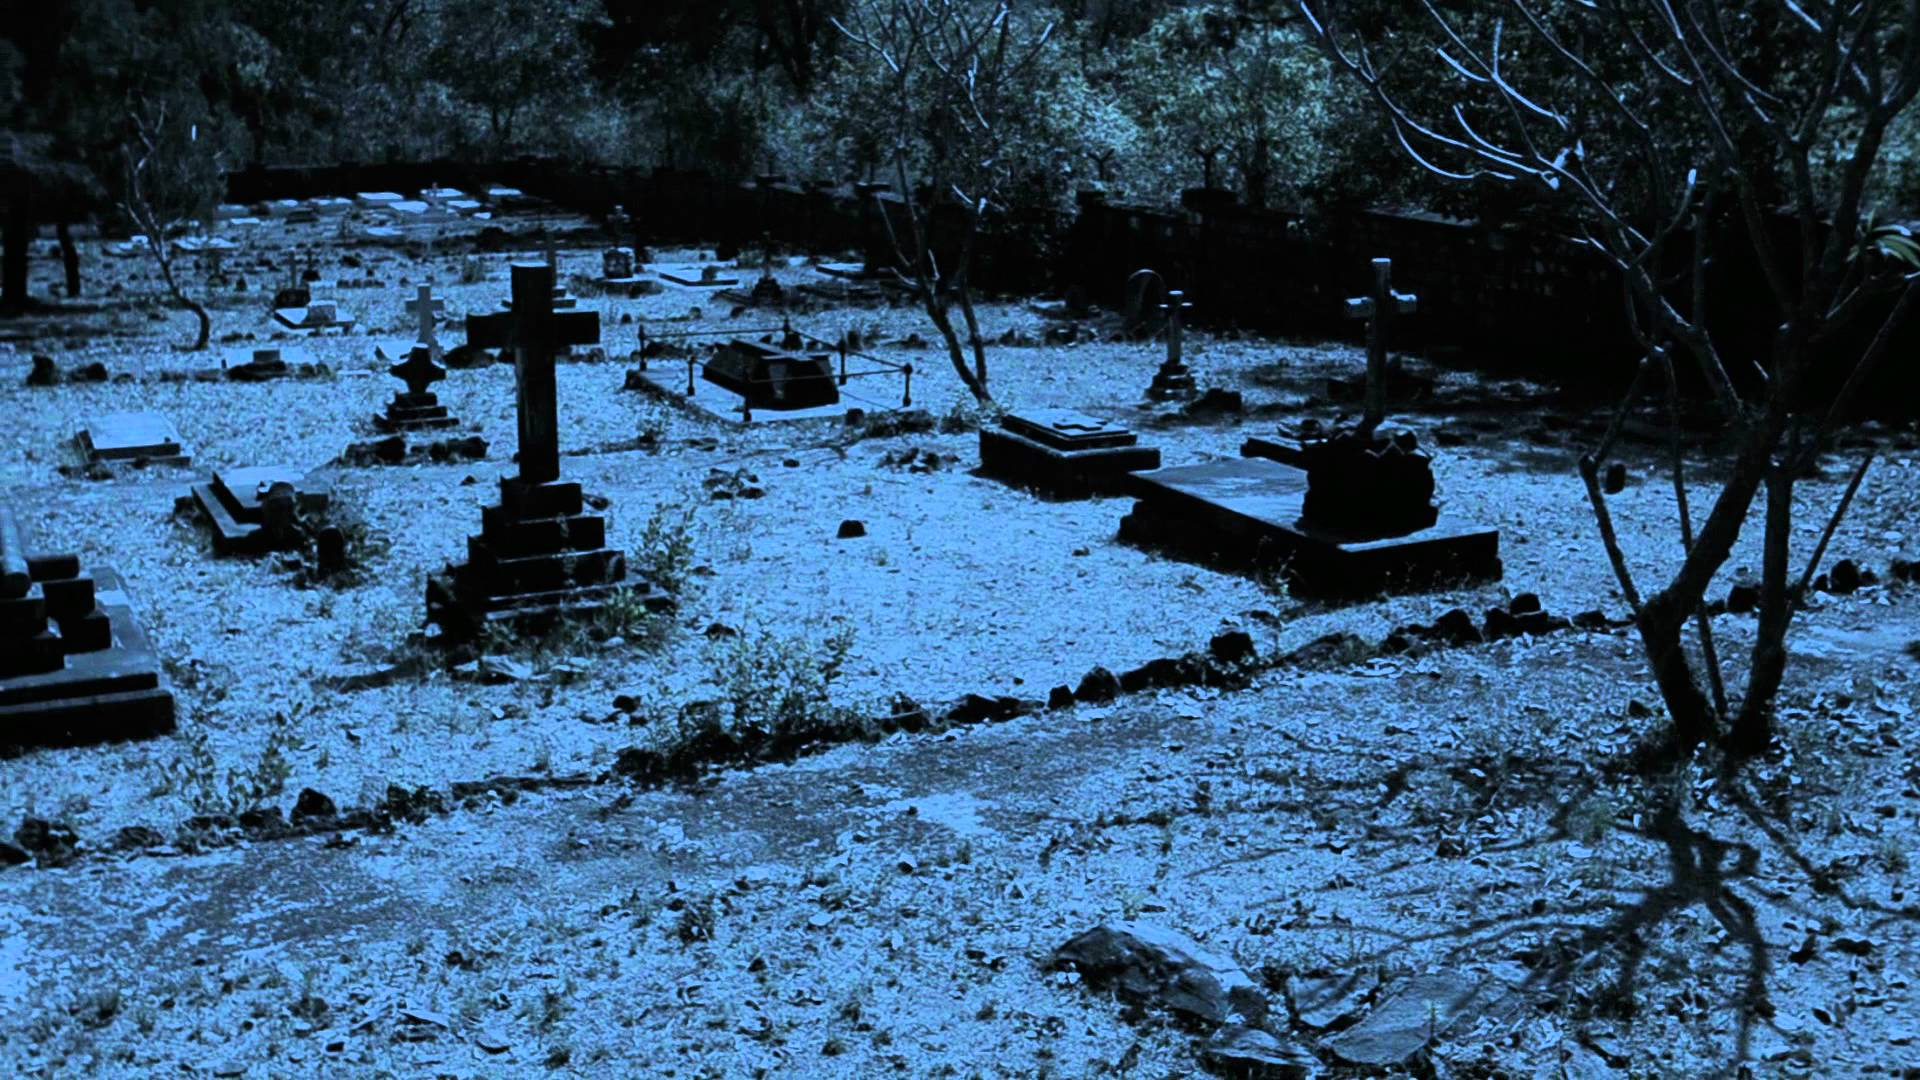 graveyard at night .... - YouTube